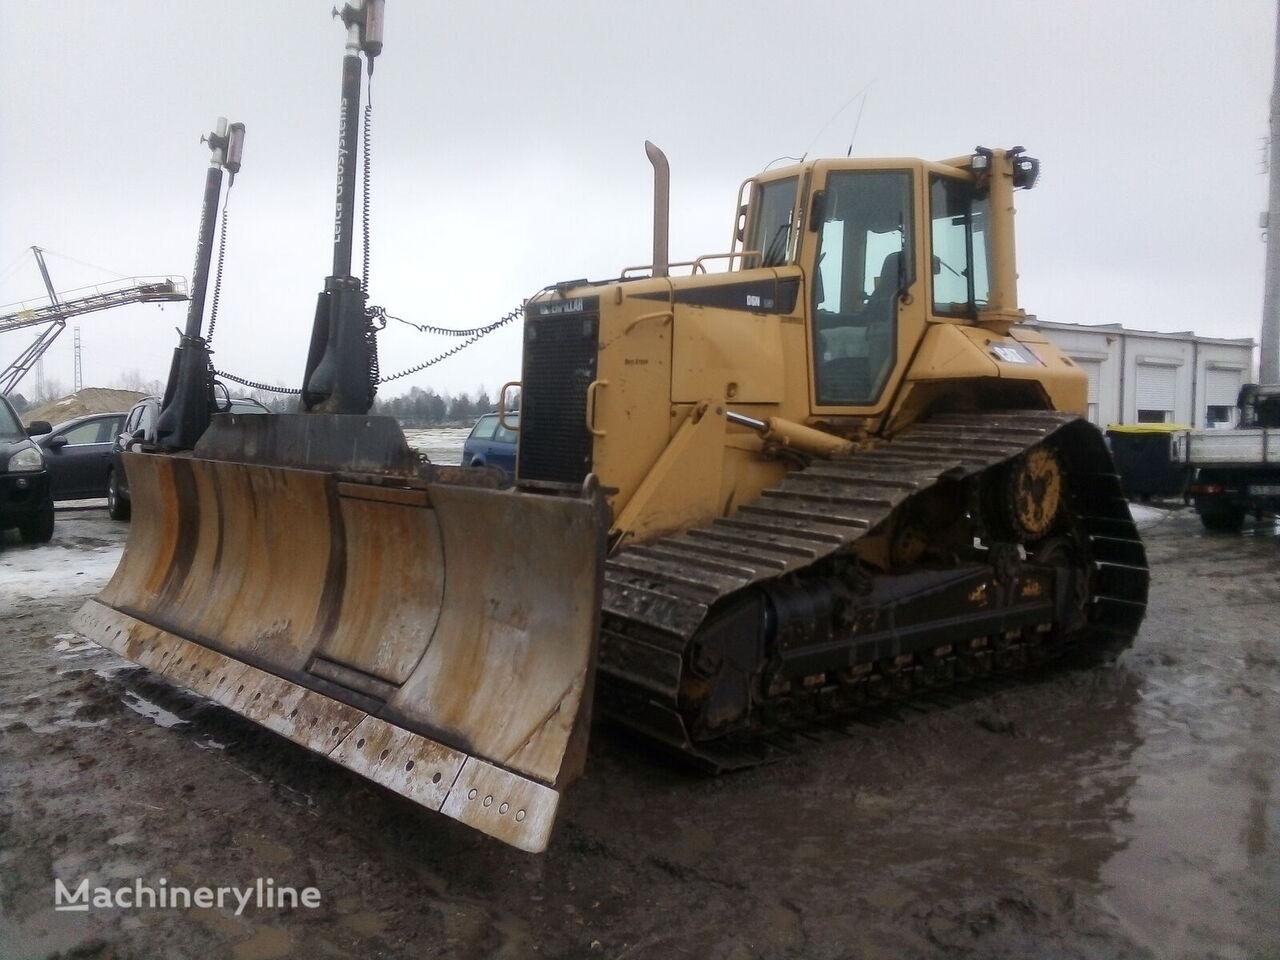 CATERPILLAR D6N bulldozer